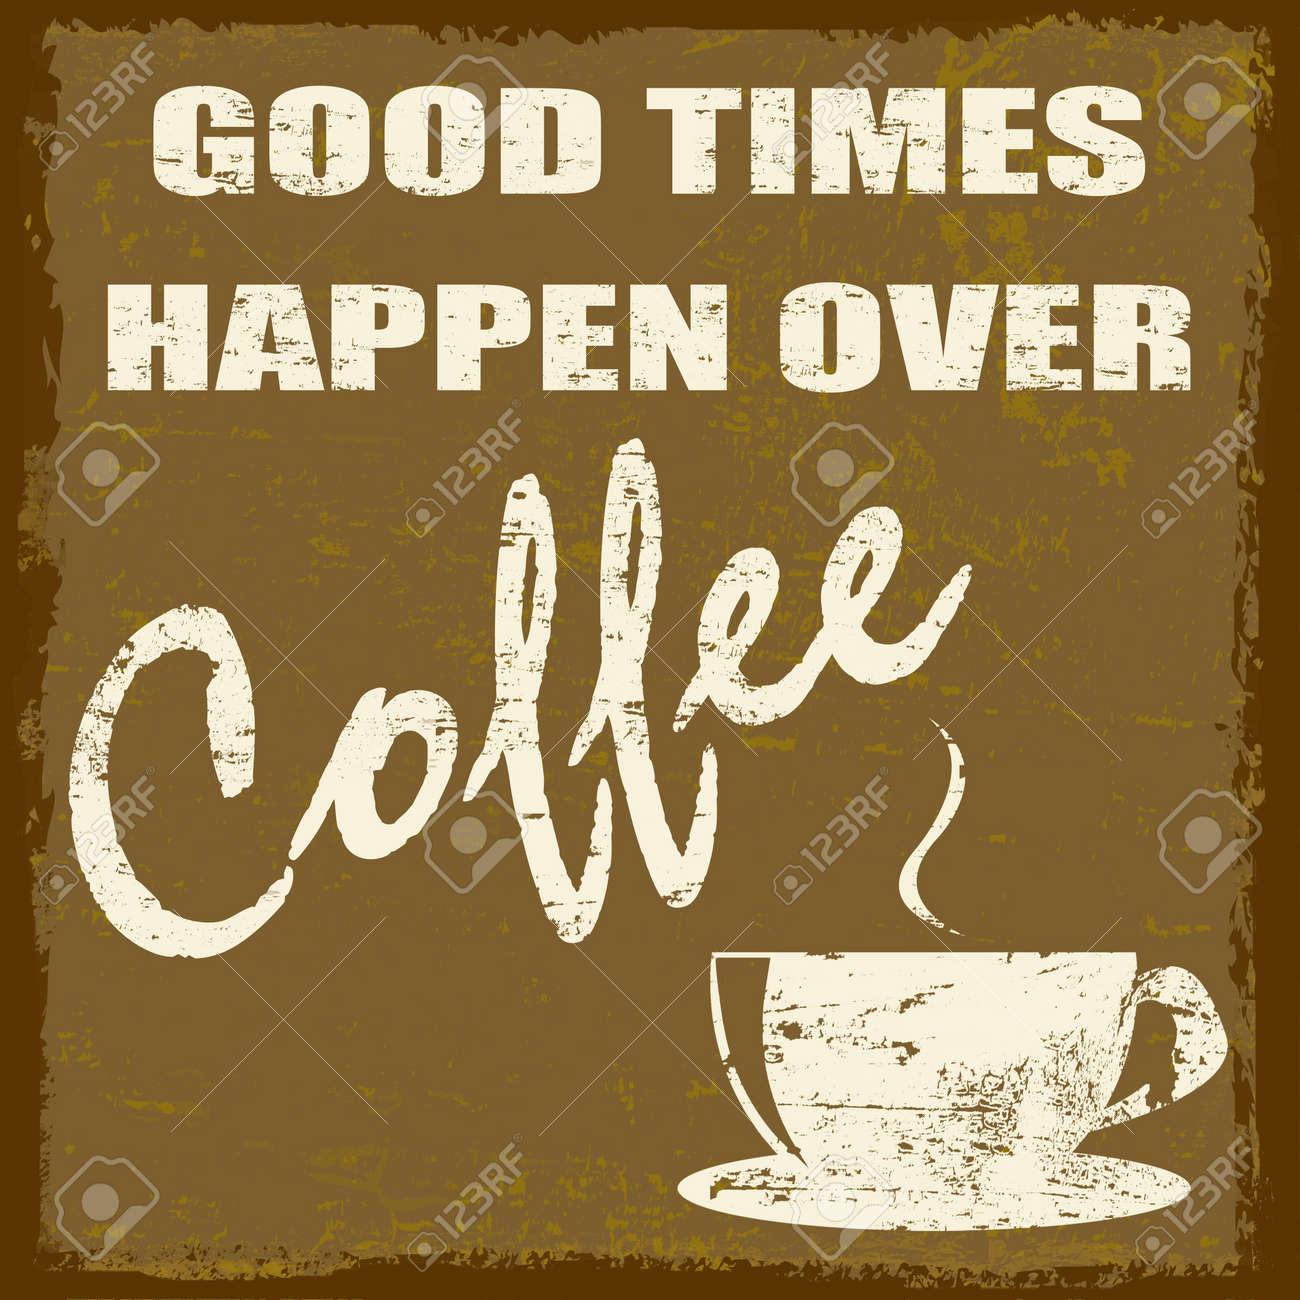 Good times happen over coffee vintage grunge poster, vector illustrator Stock Vector - 18504413